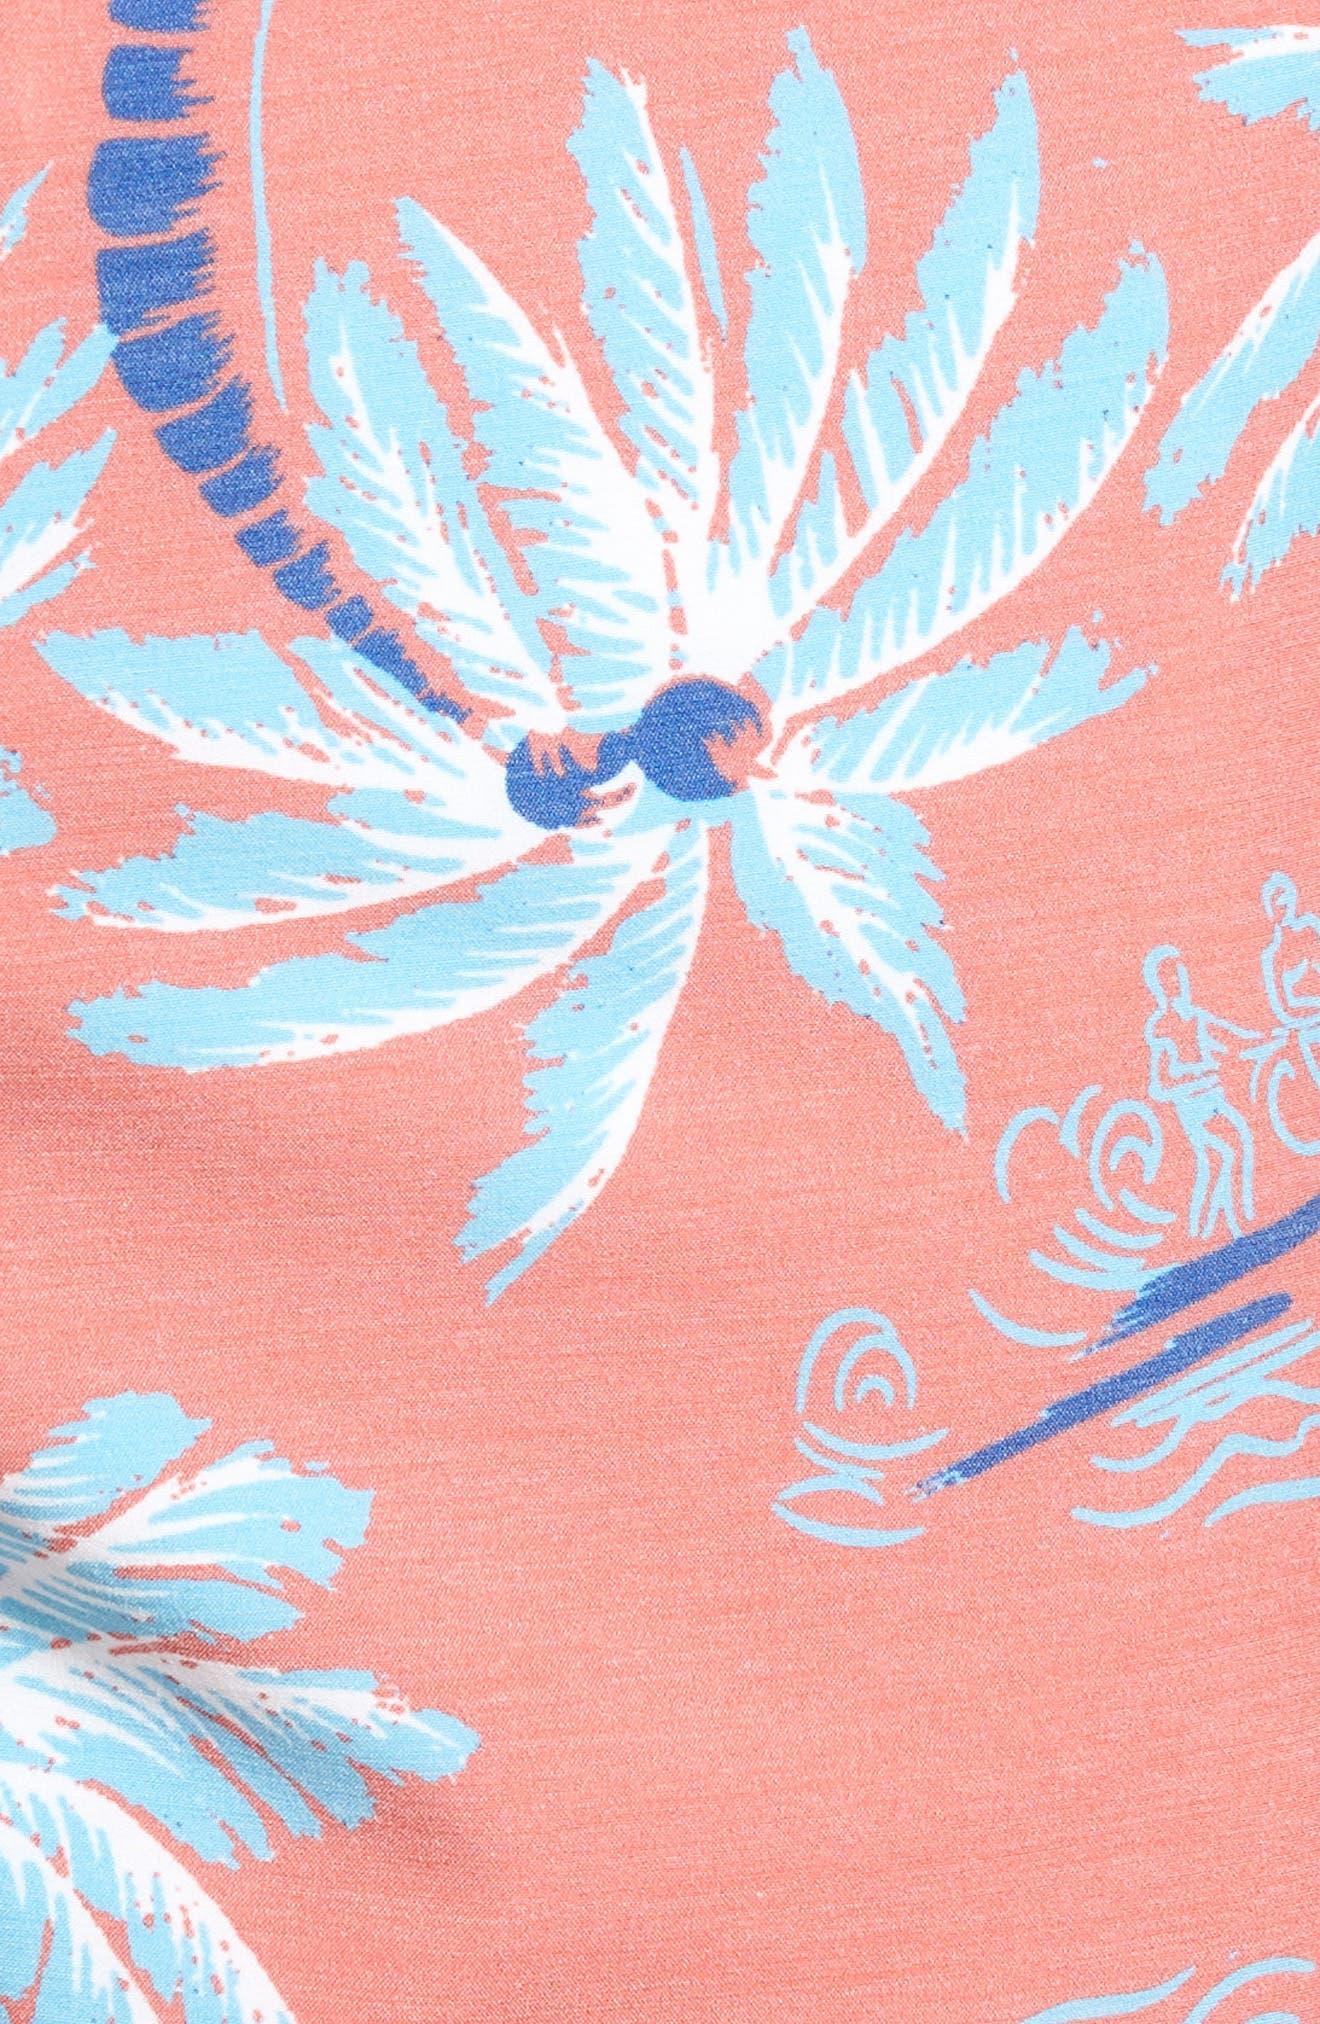 Classic Board Shorts,                             Alternate thumbnail 4, color,                             Red Palm Hawaiian